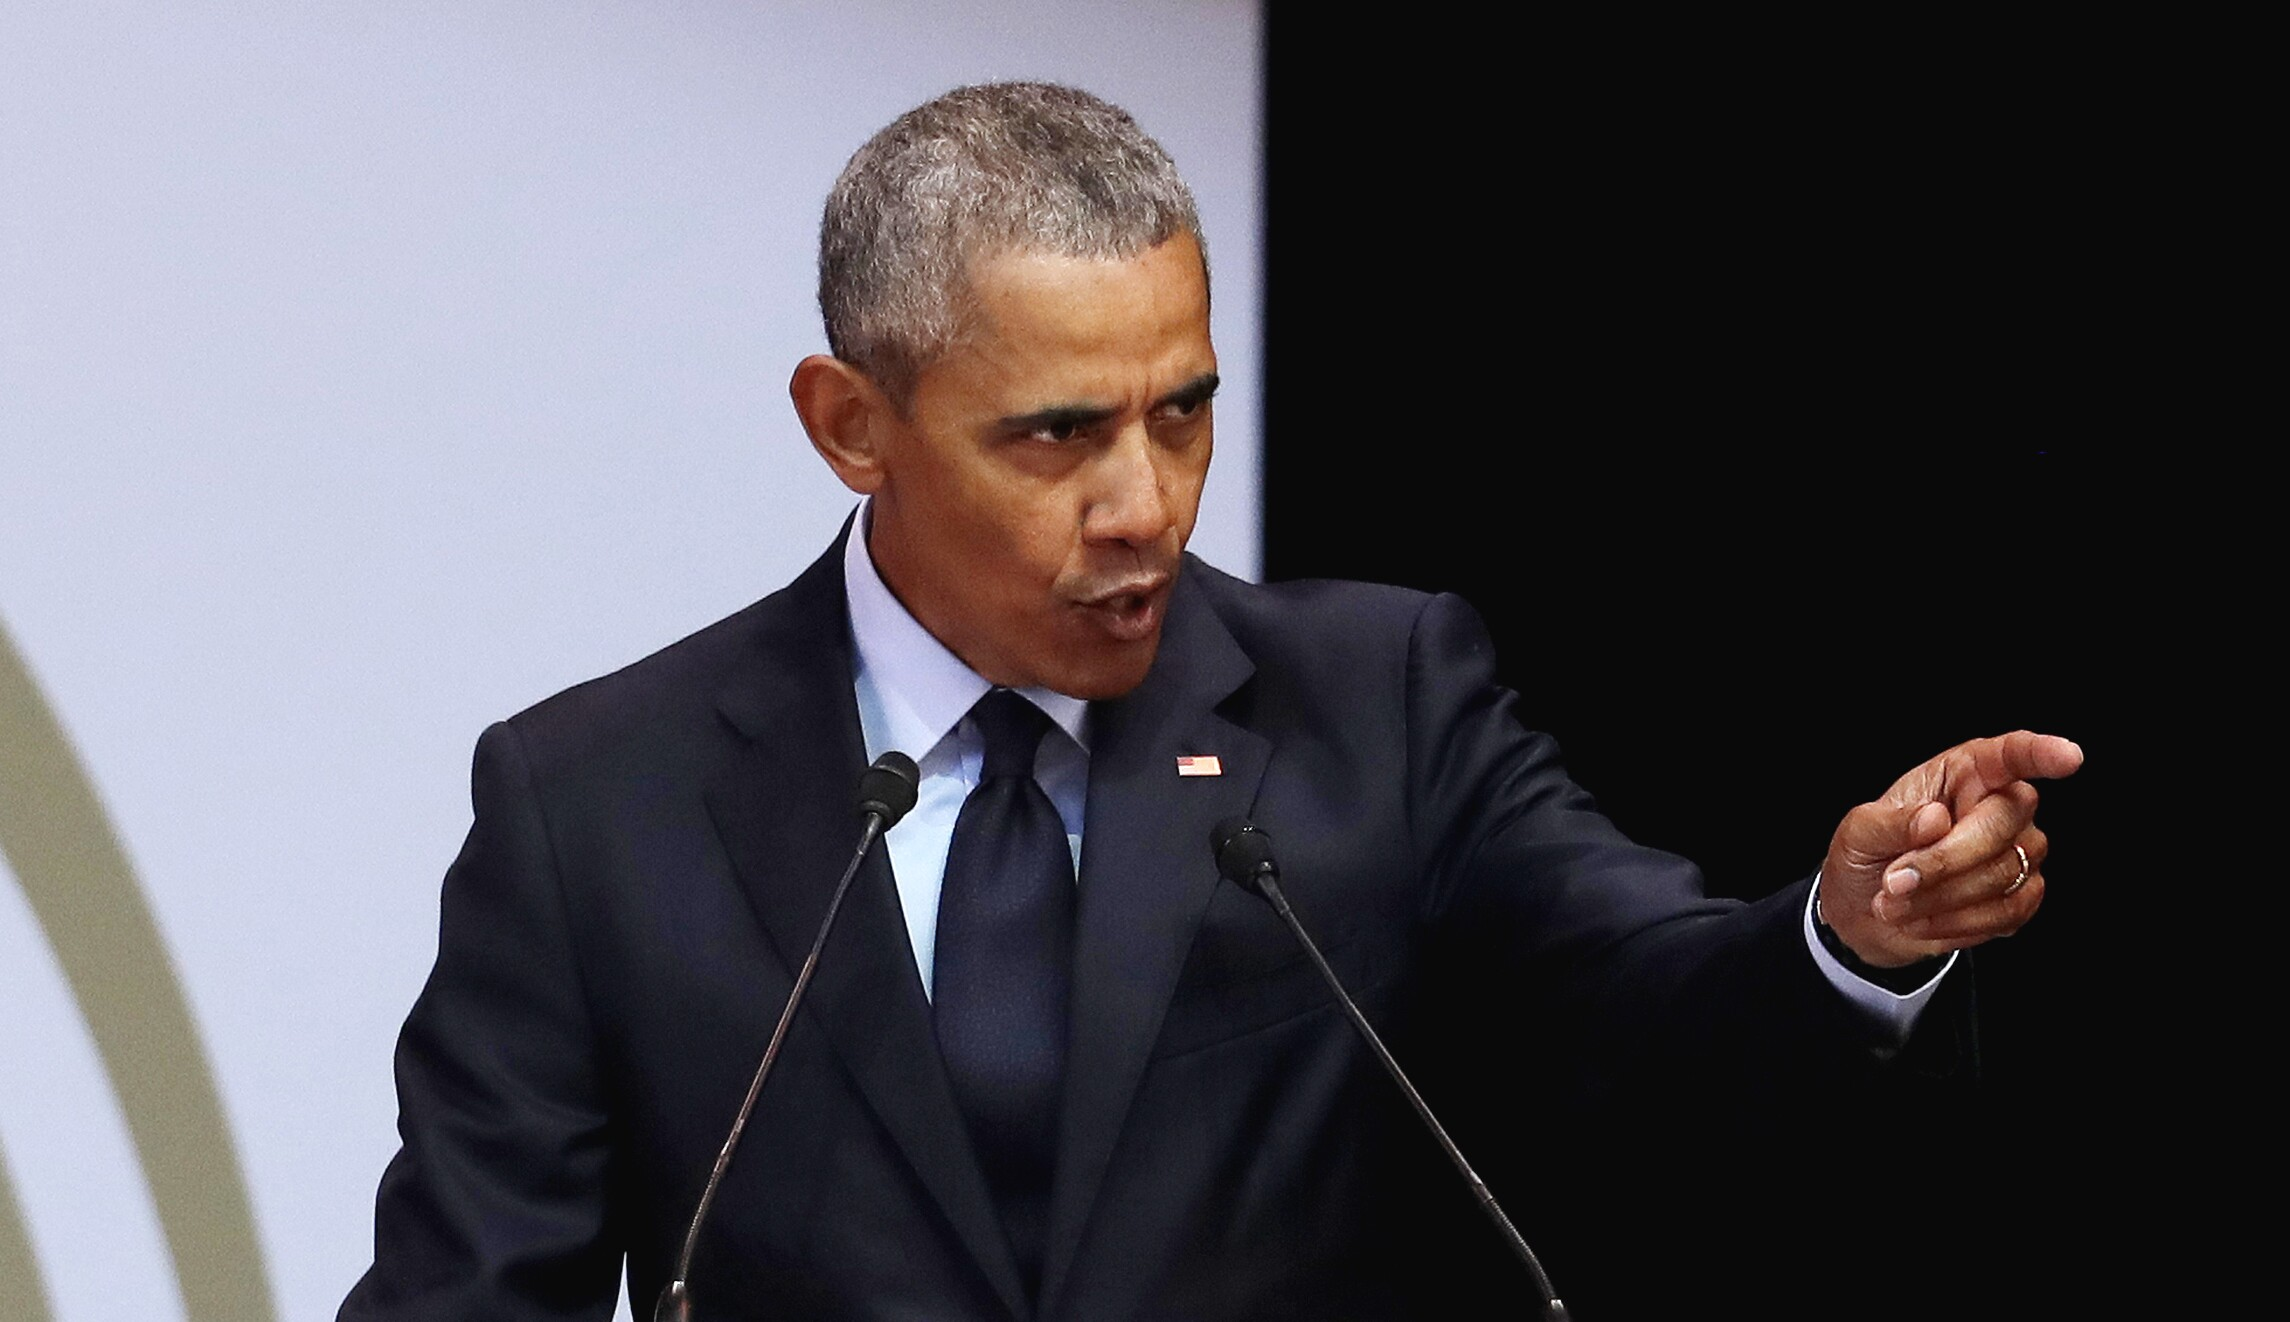 WATCH: Barack Obama\'s full Mandela speech in South Africa